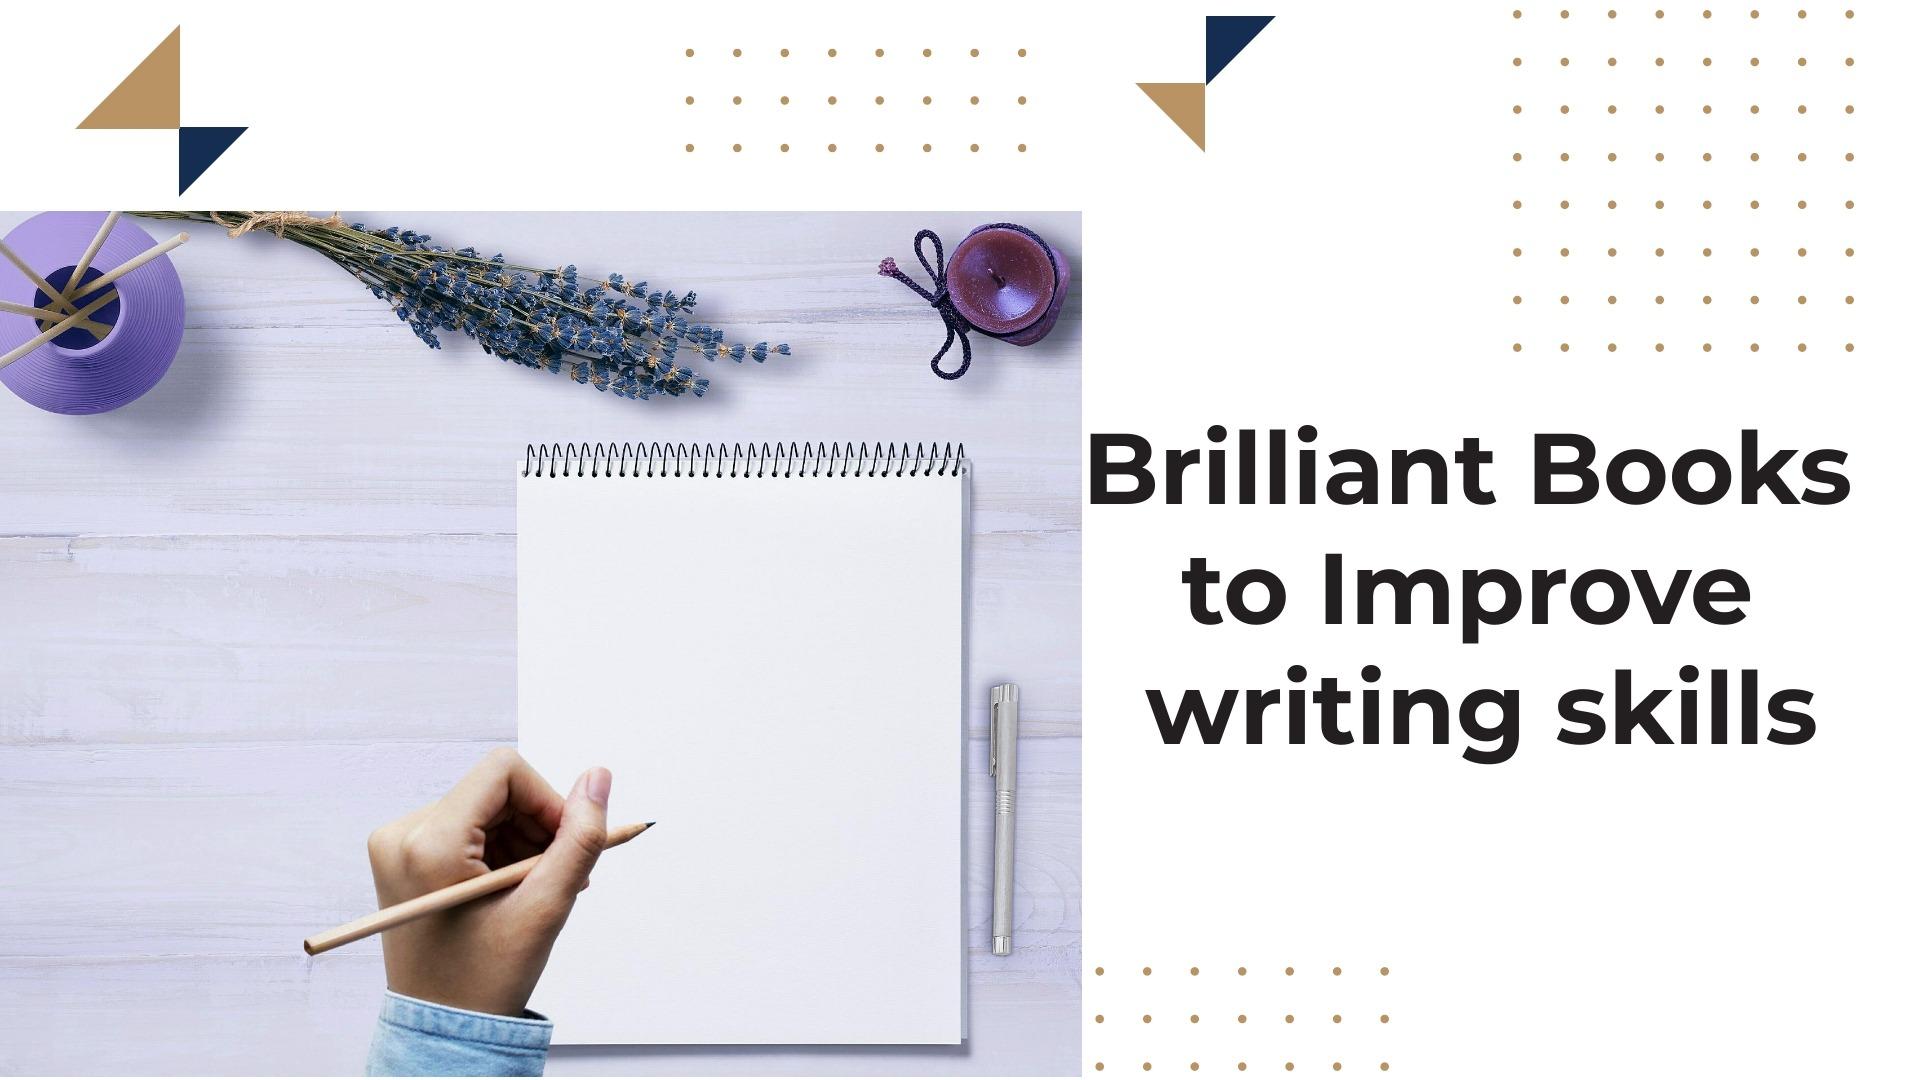 Brilliant books to improve writing skills